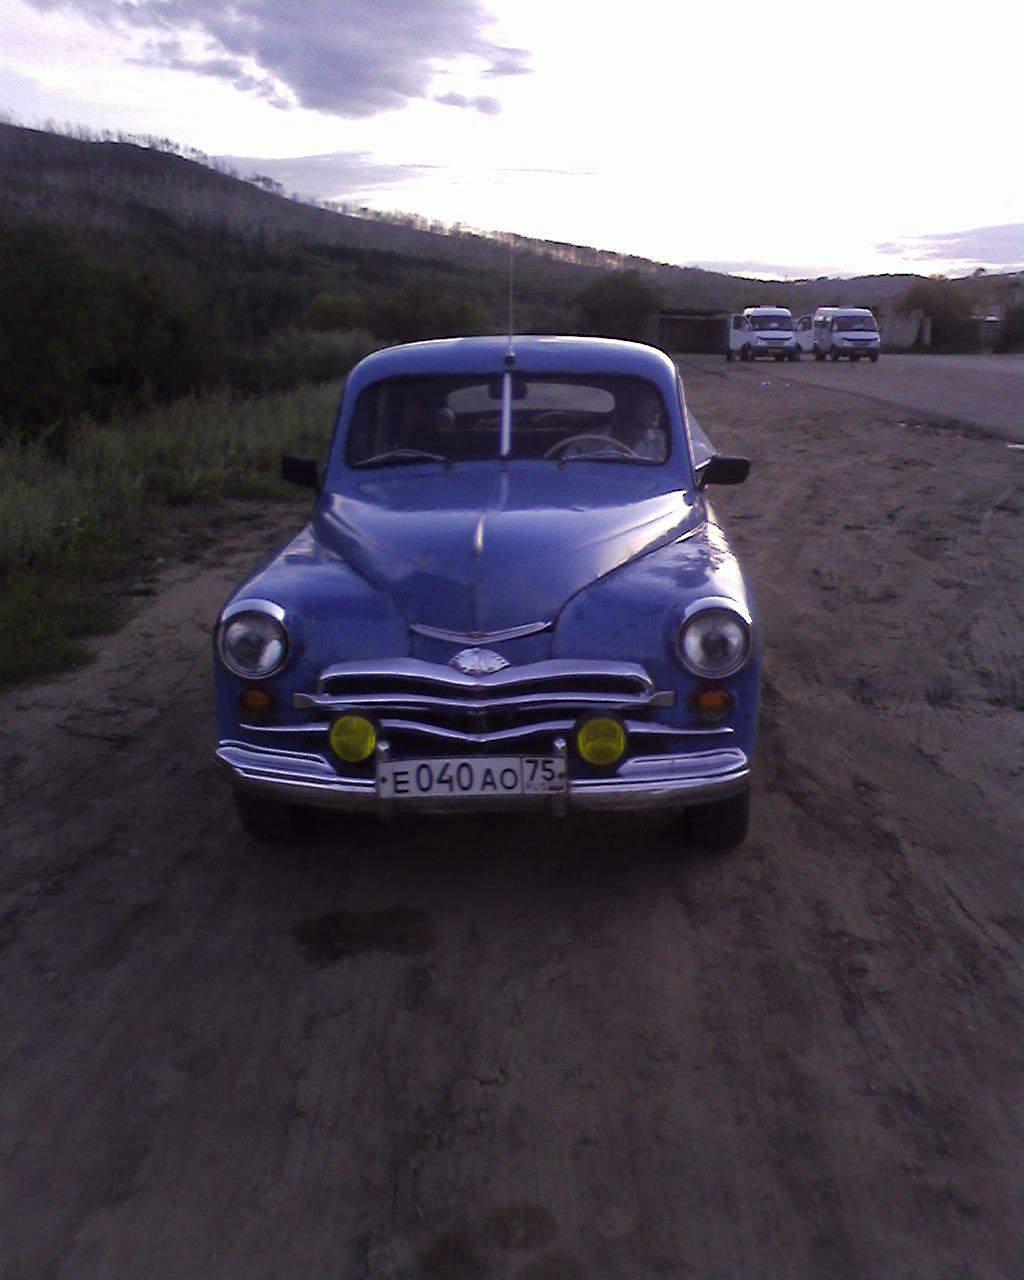 "Tobi's Mk1 VW Jetta Coupe on 14"" Image Billet 60's - 9559"